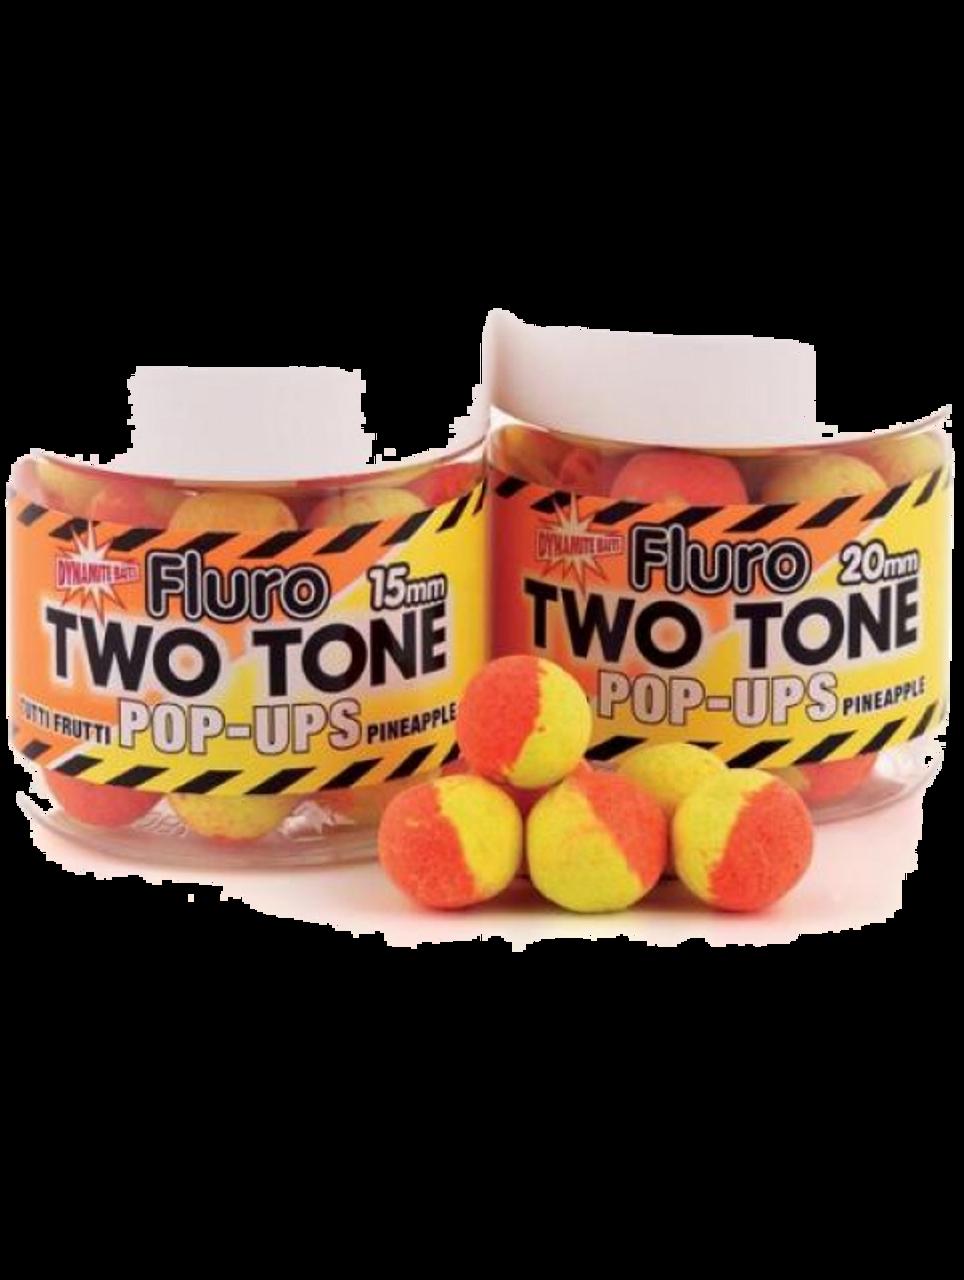 Dynamite Fluro Tutti Frutti & Pineapple Two Tone Pop-Ups